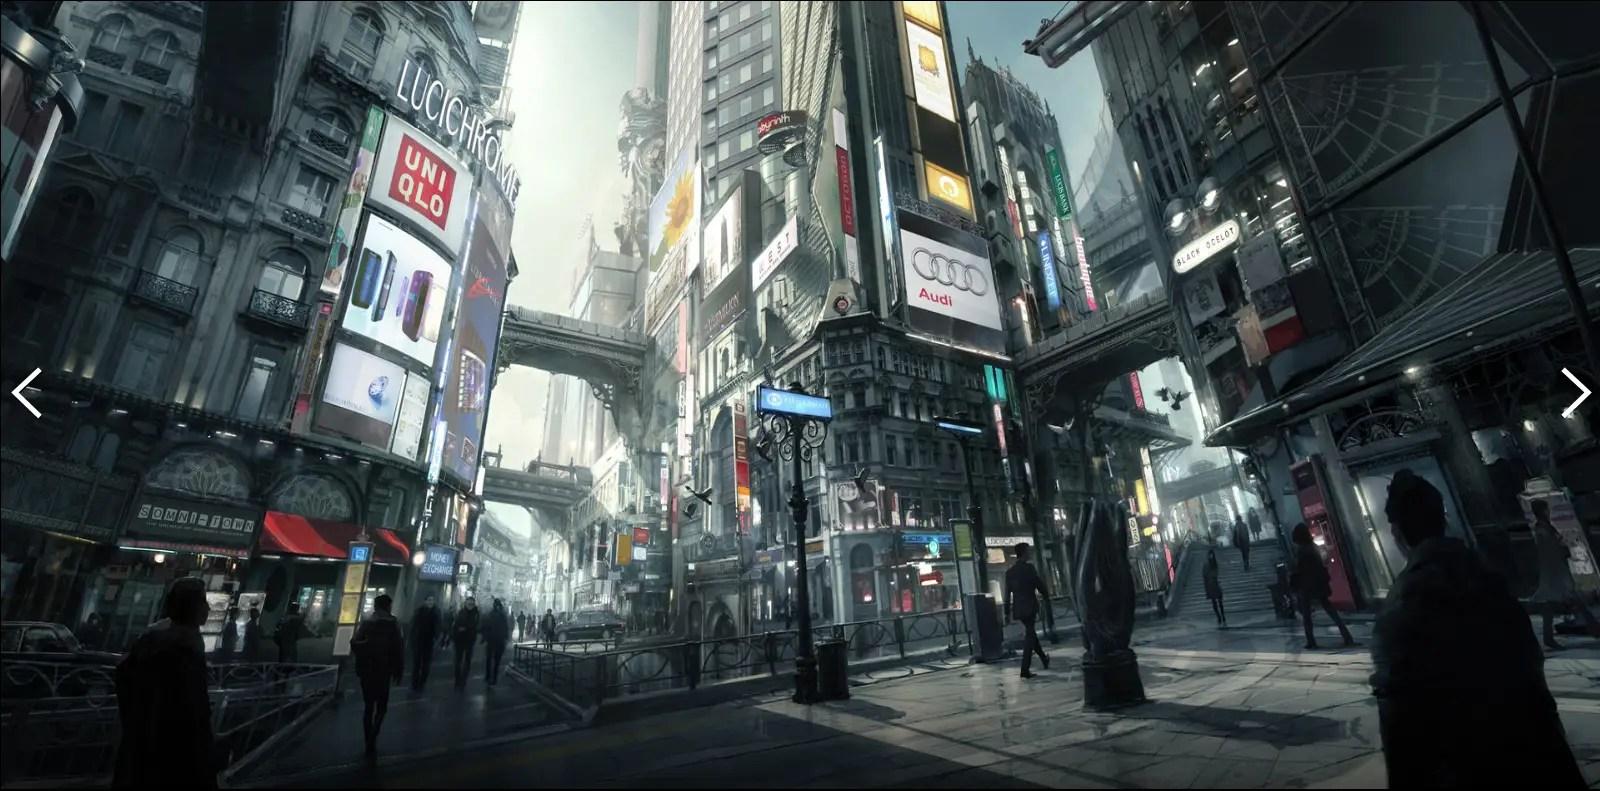 Dr Dre Wallpaper Hd Kingsglaive Final Fantasy Xv Detailed In New Concept Art